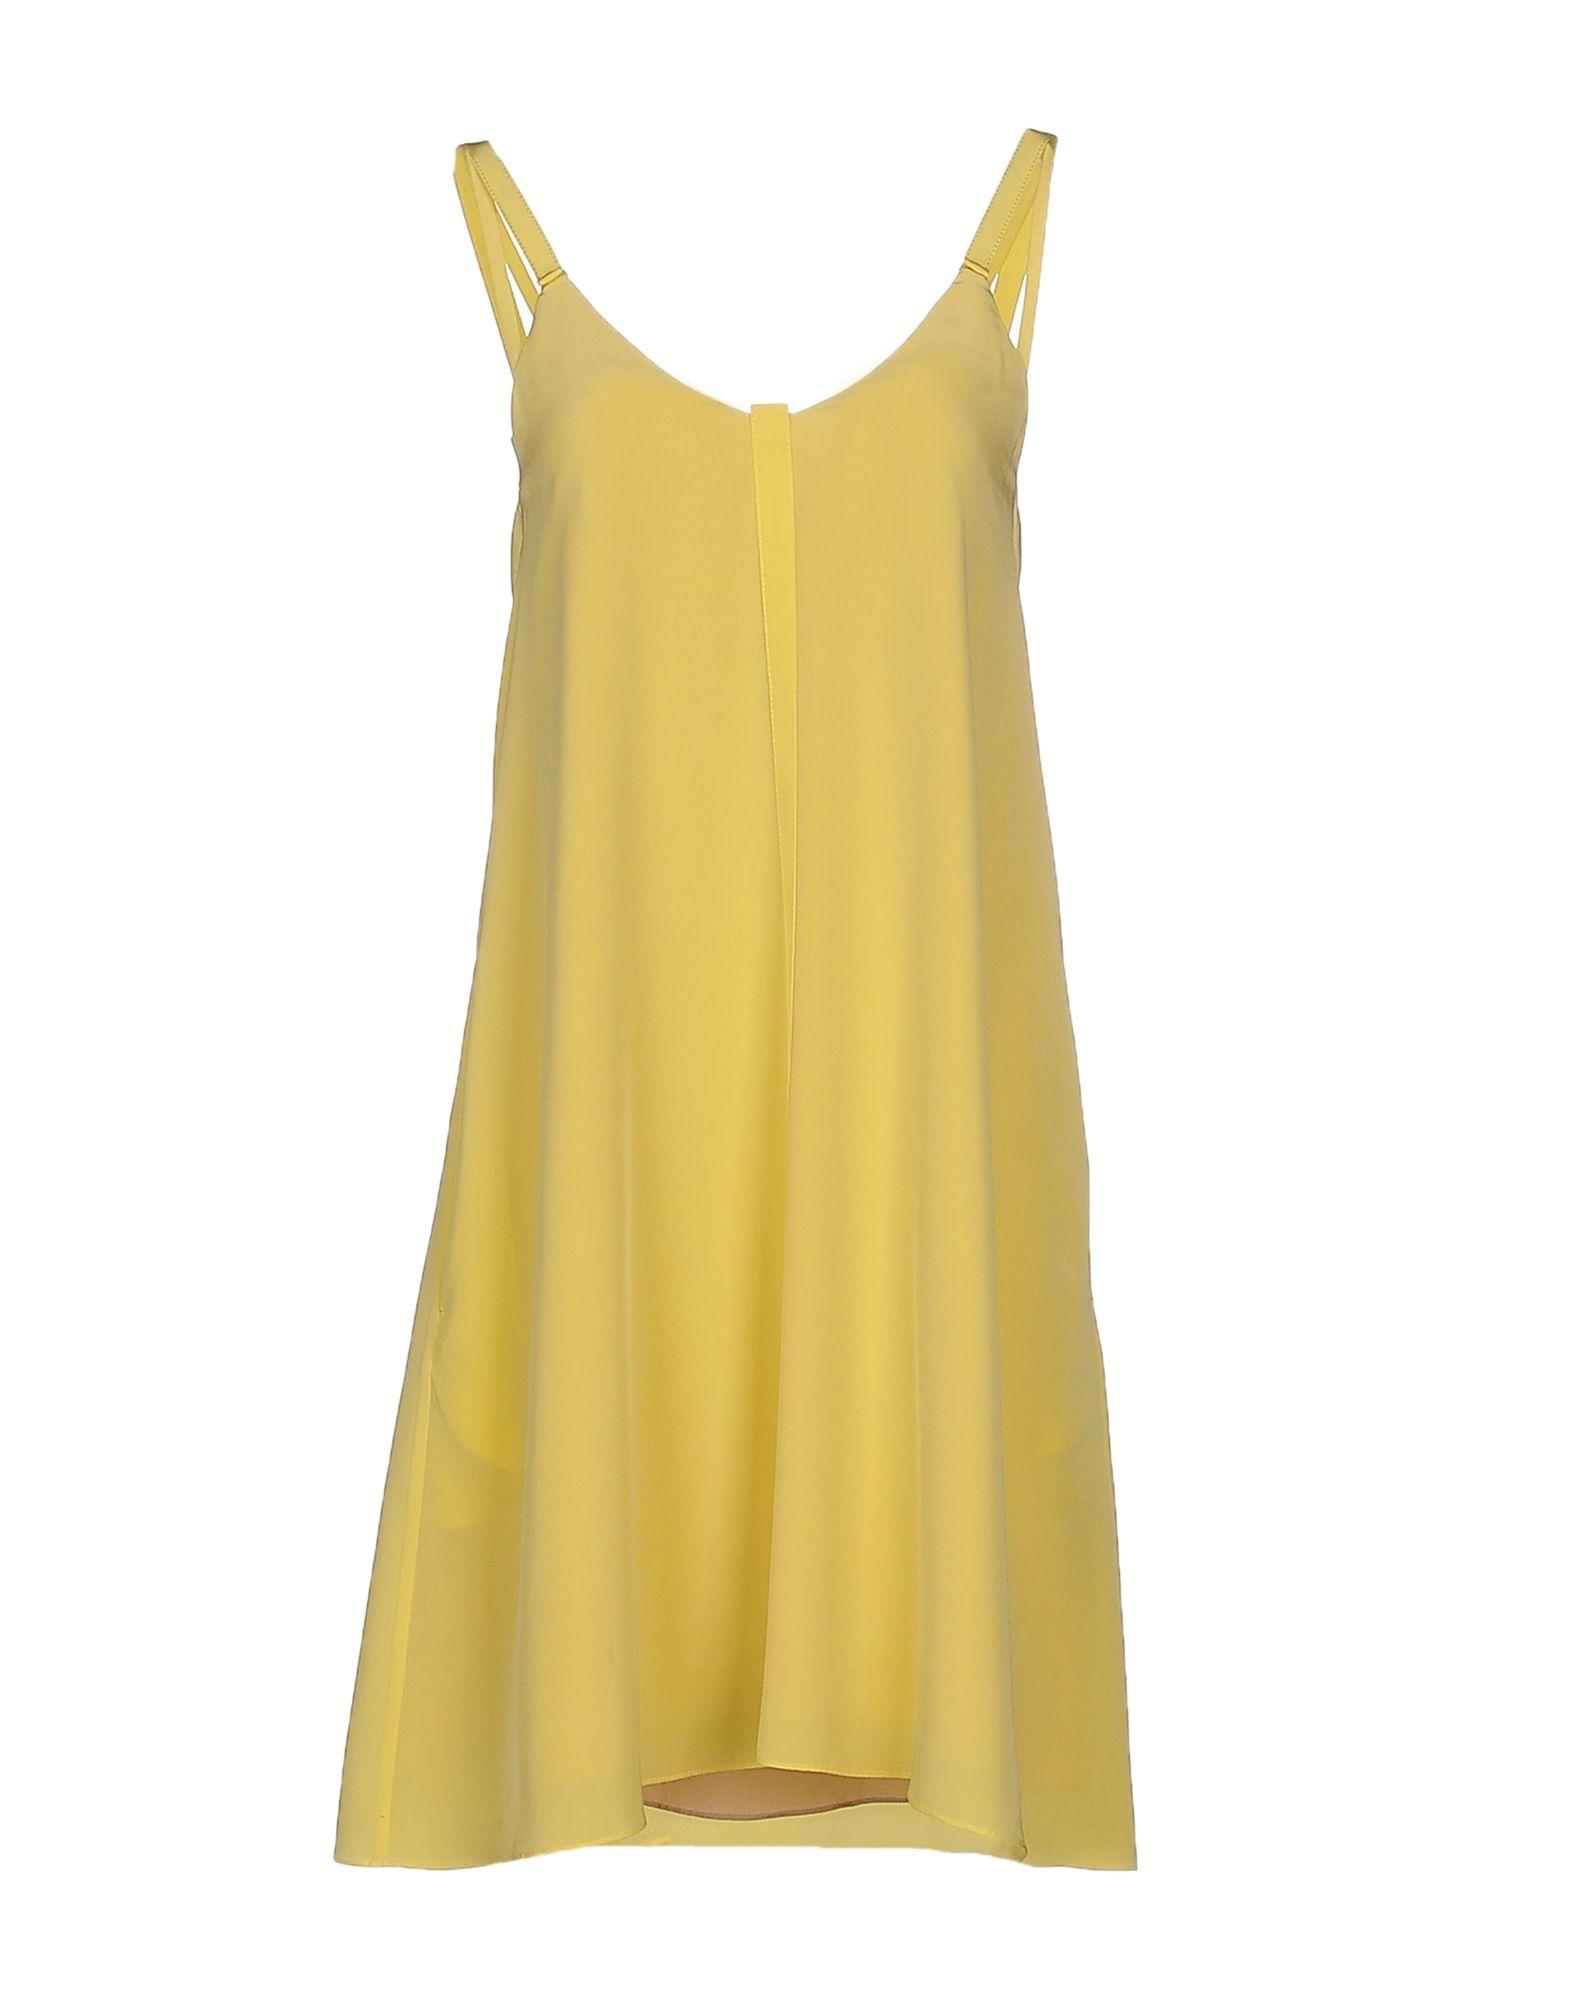 dorothee schumacher short dress in yellow lyst. Black Bedroom Furniture Sets. Home Design Ideas